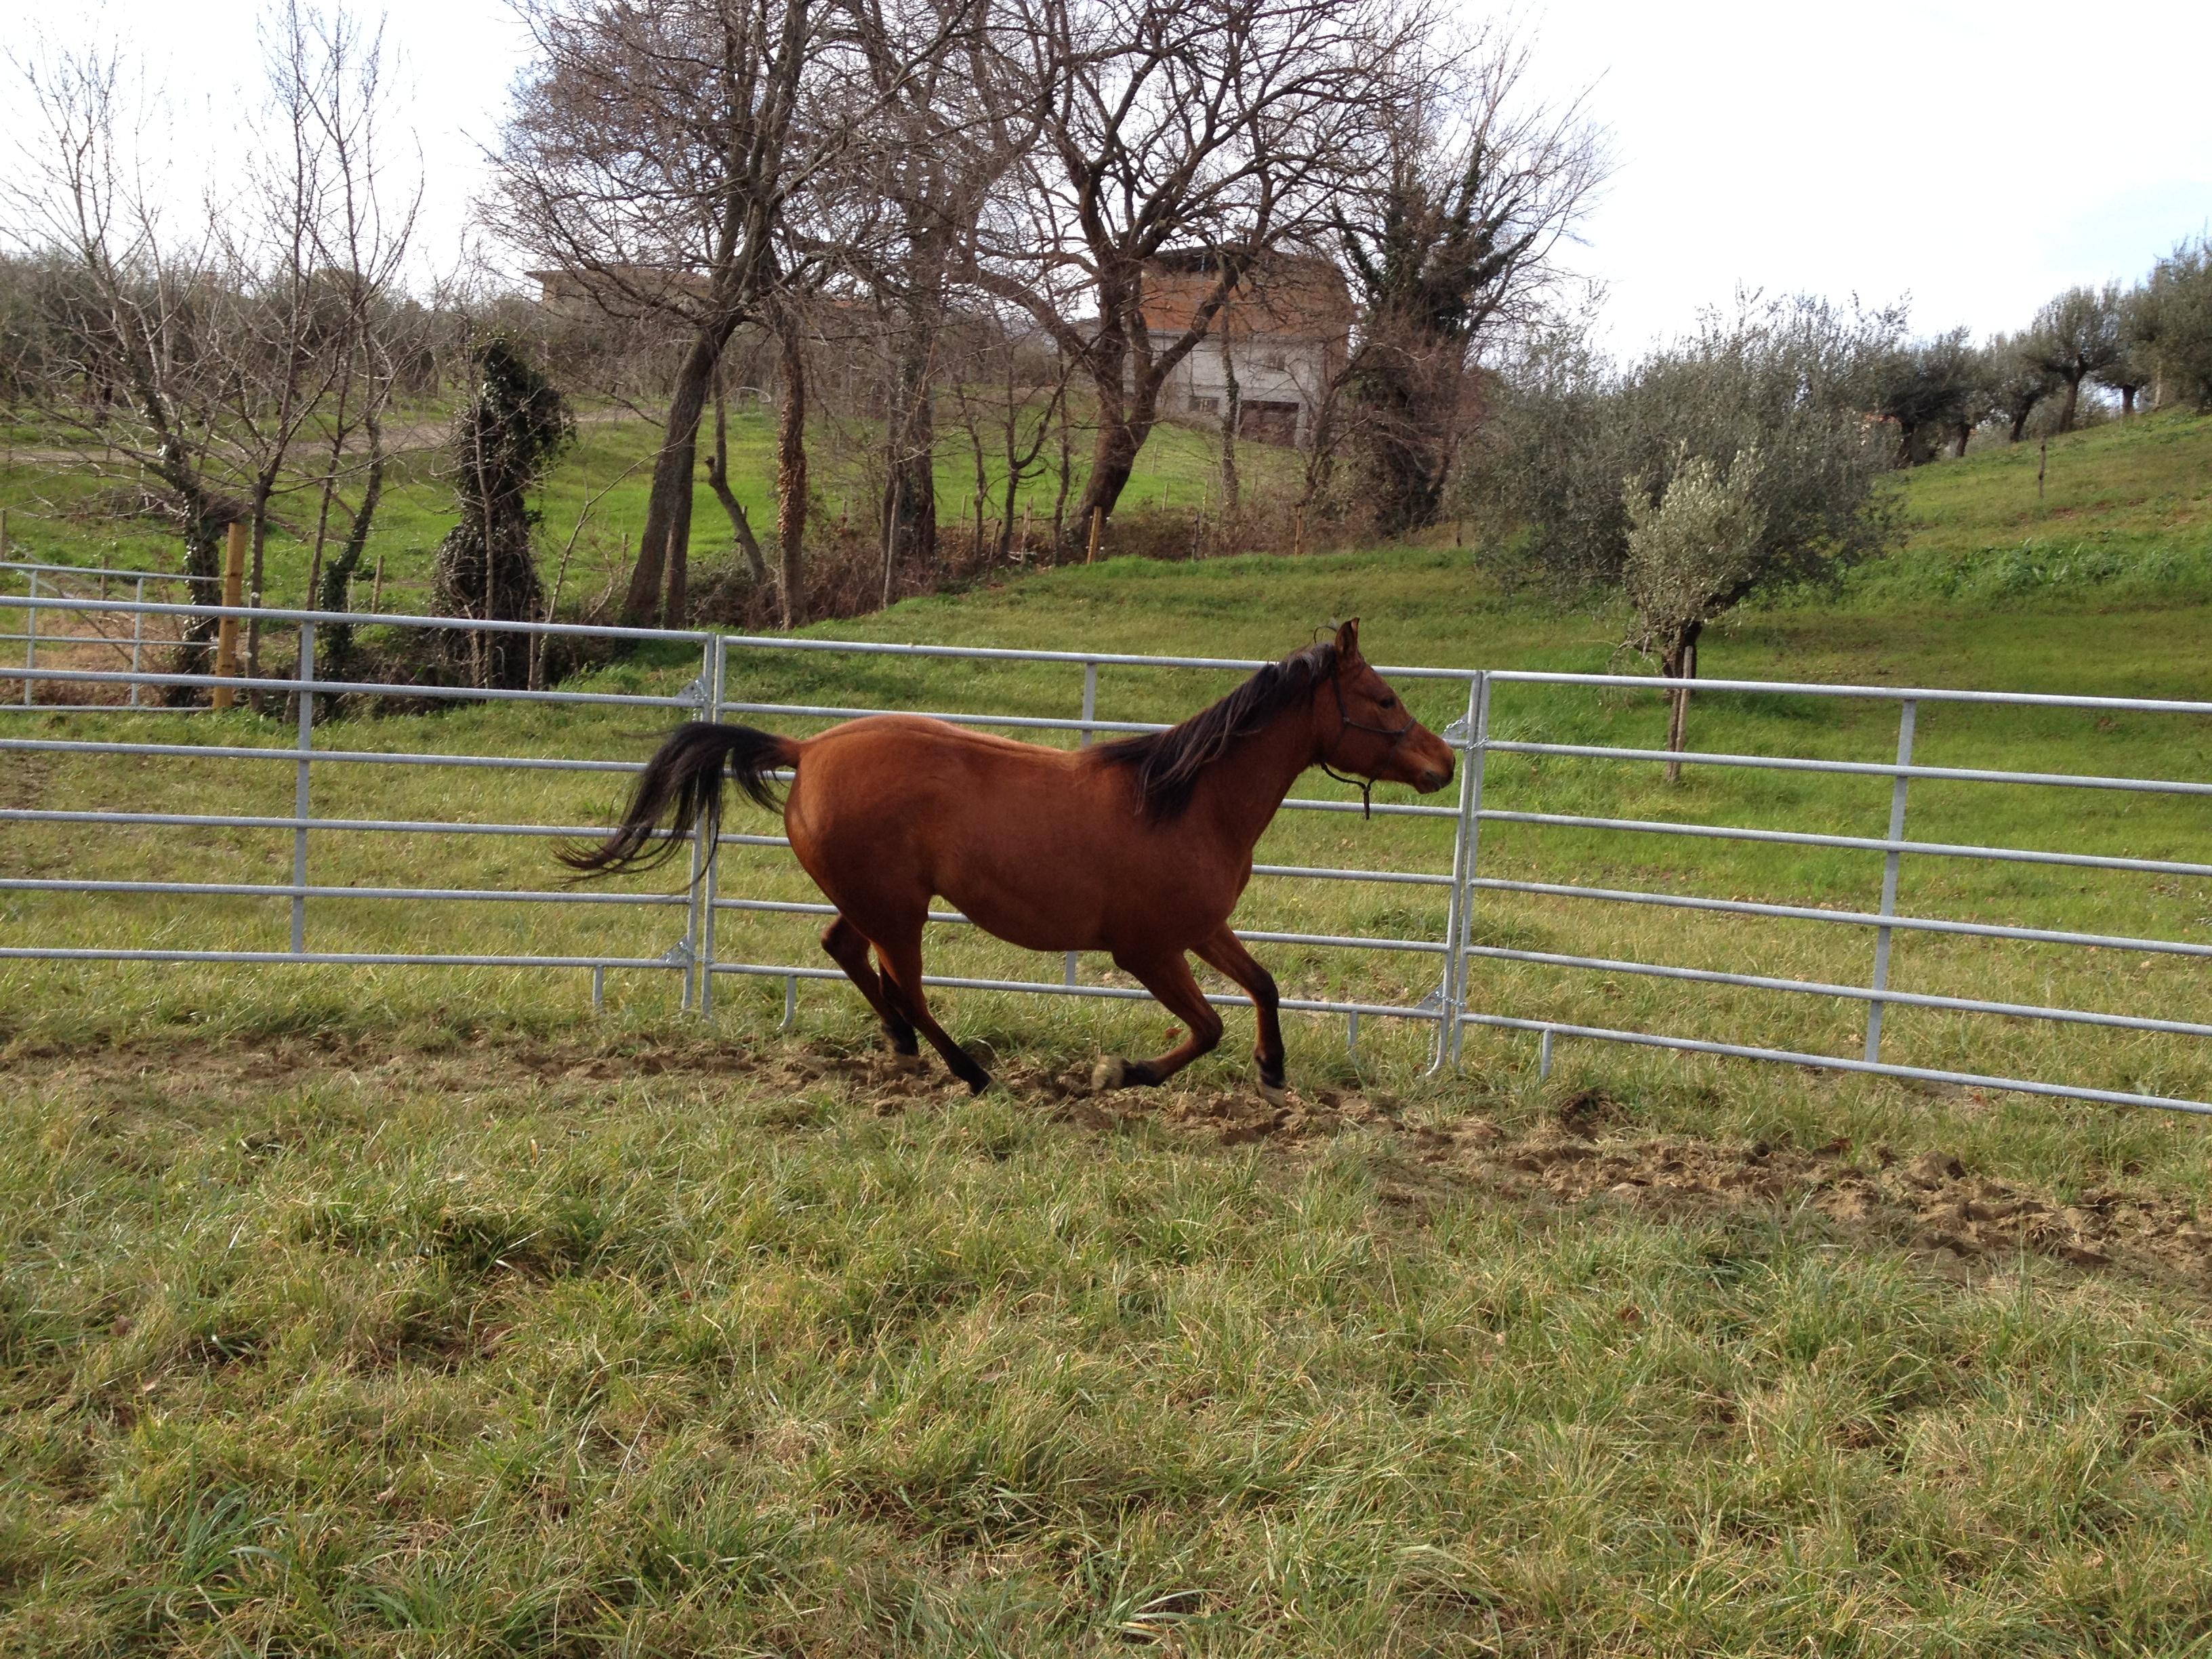 Tondino Per Cavalli.Tondino Per Cavalli